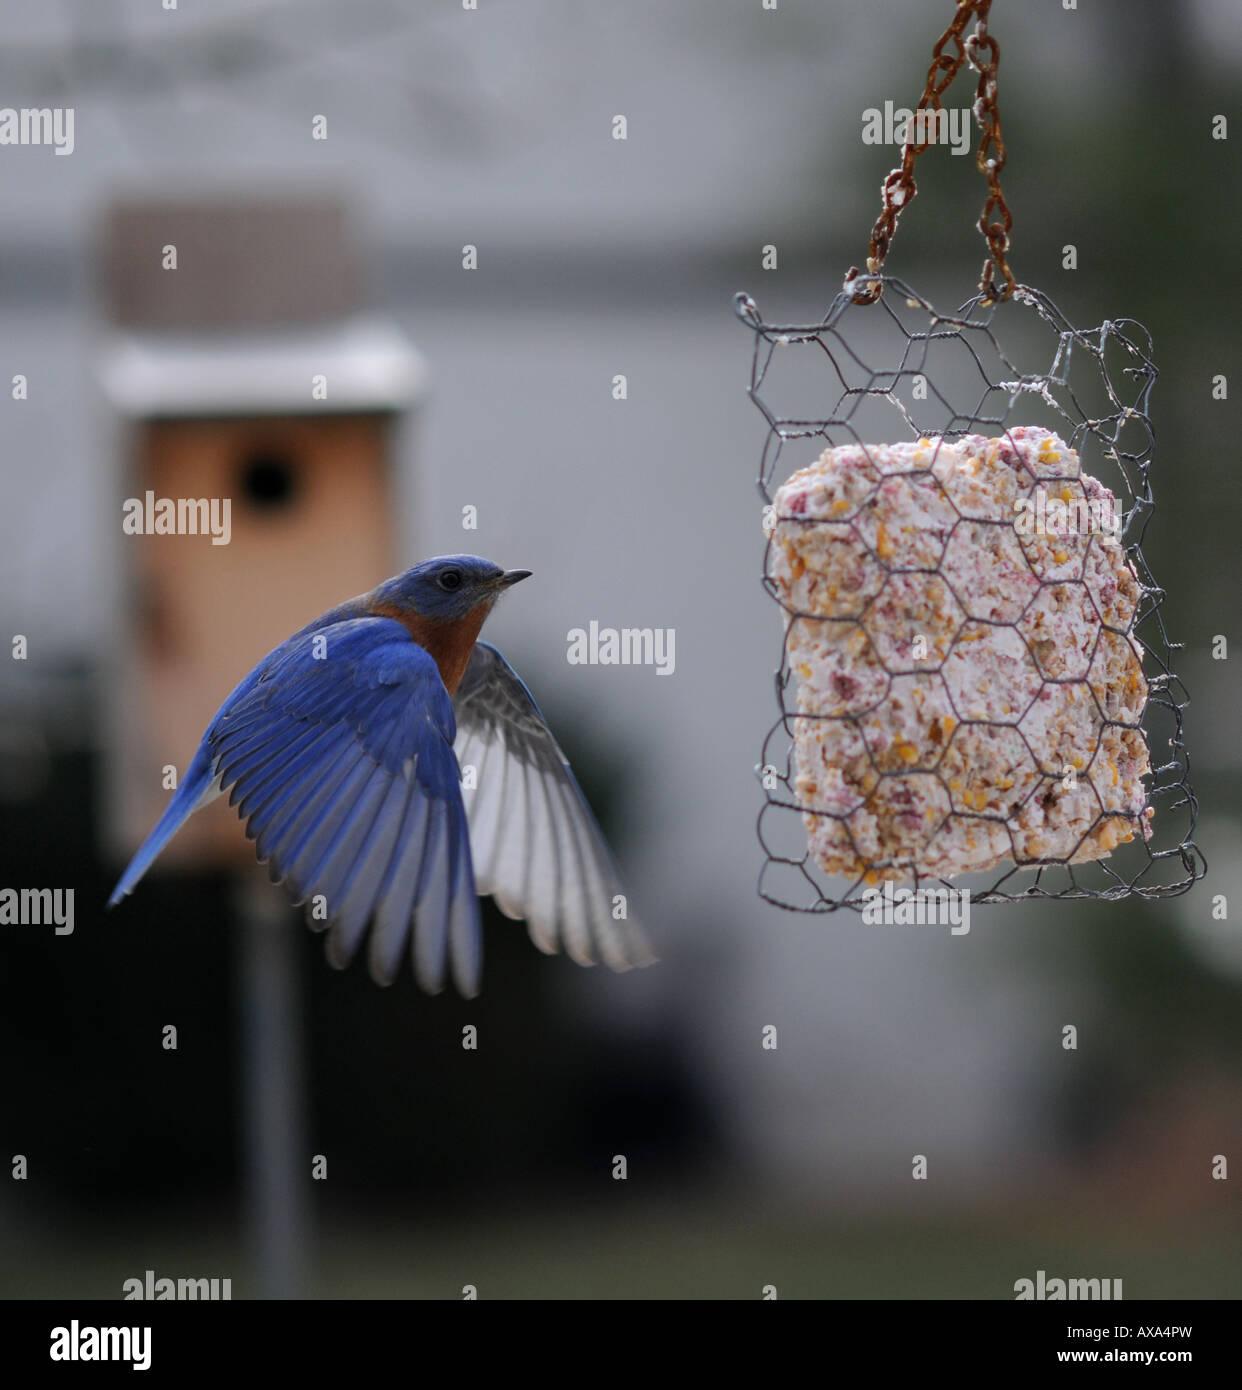 Bluebird - Stock Image